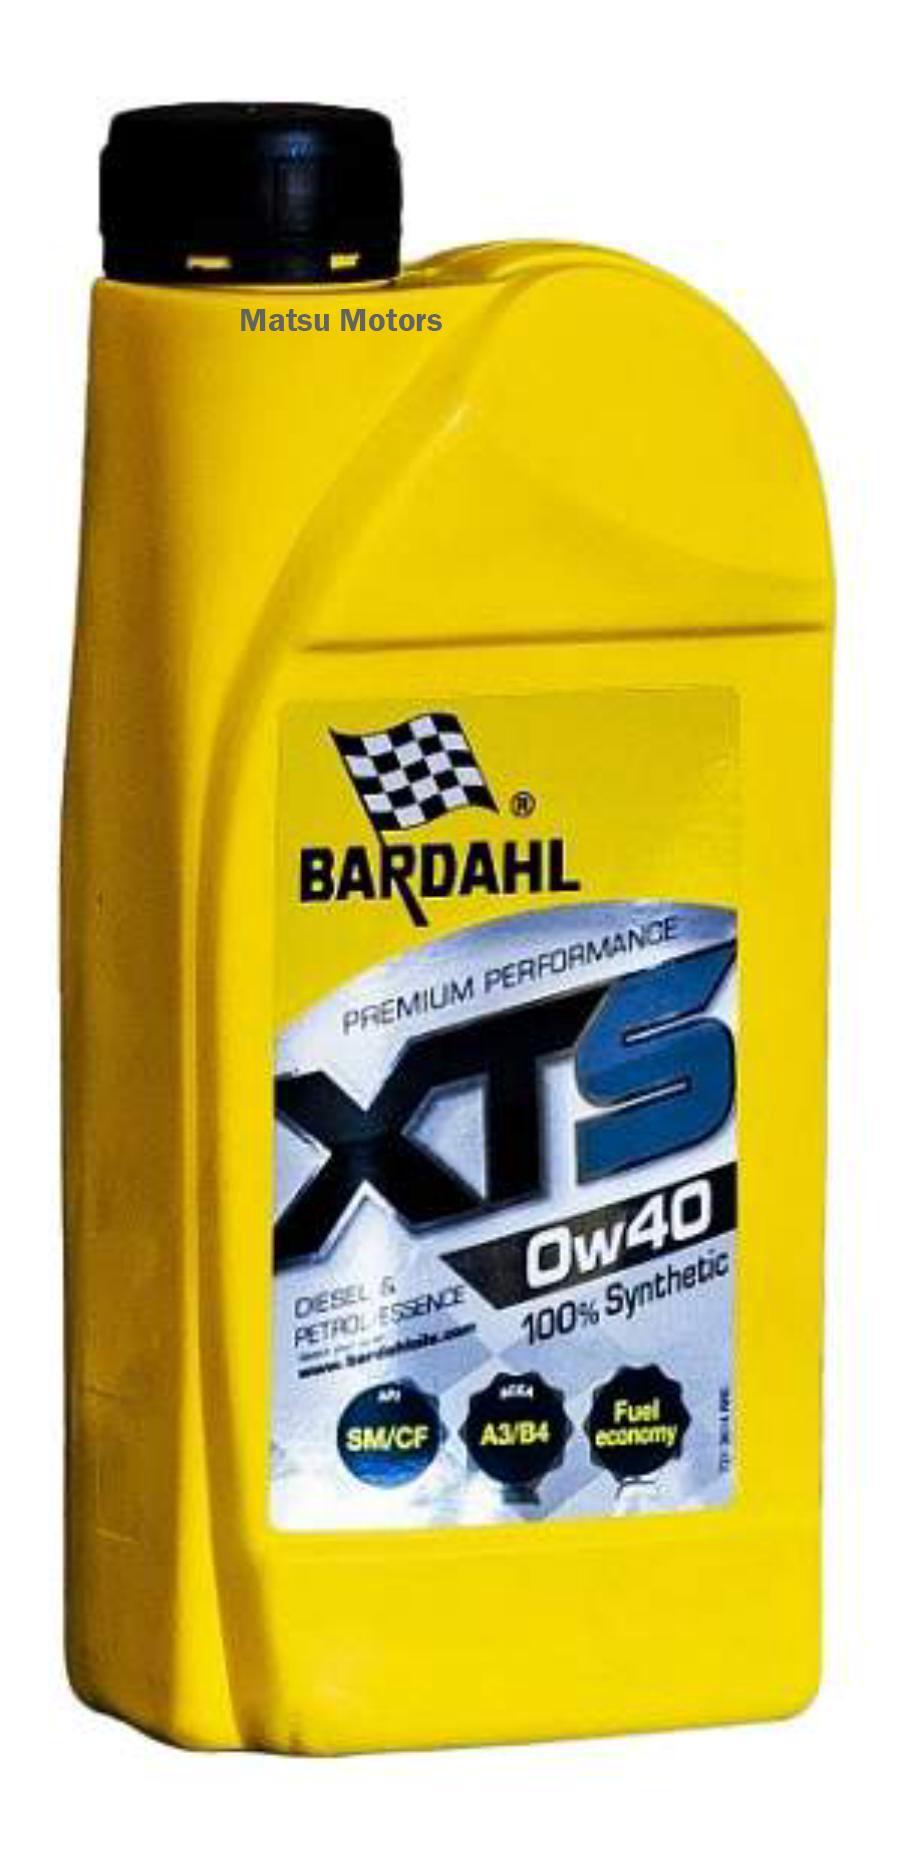 Масло BARDAHL 0W40 XTS SM/CF 1 литр A3/B4